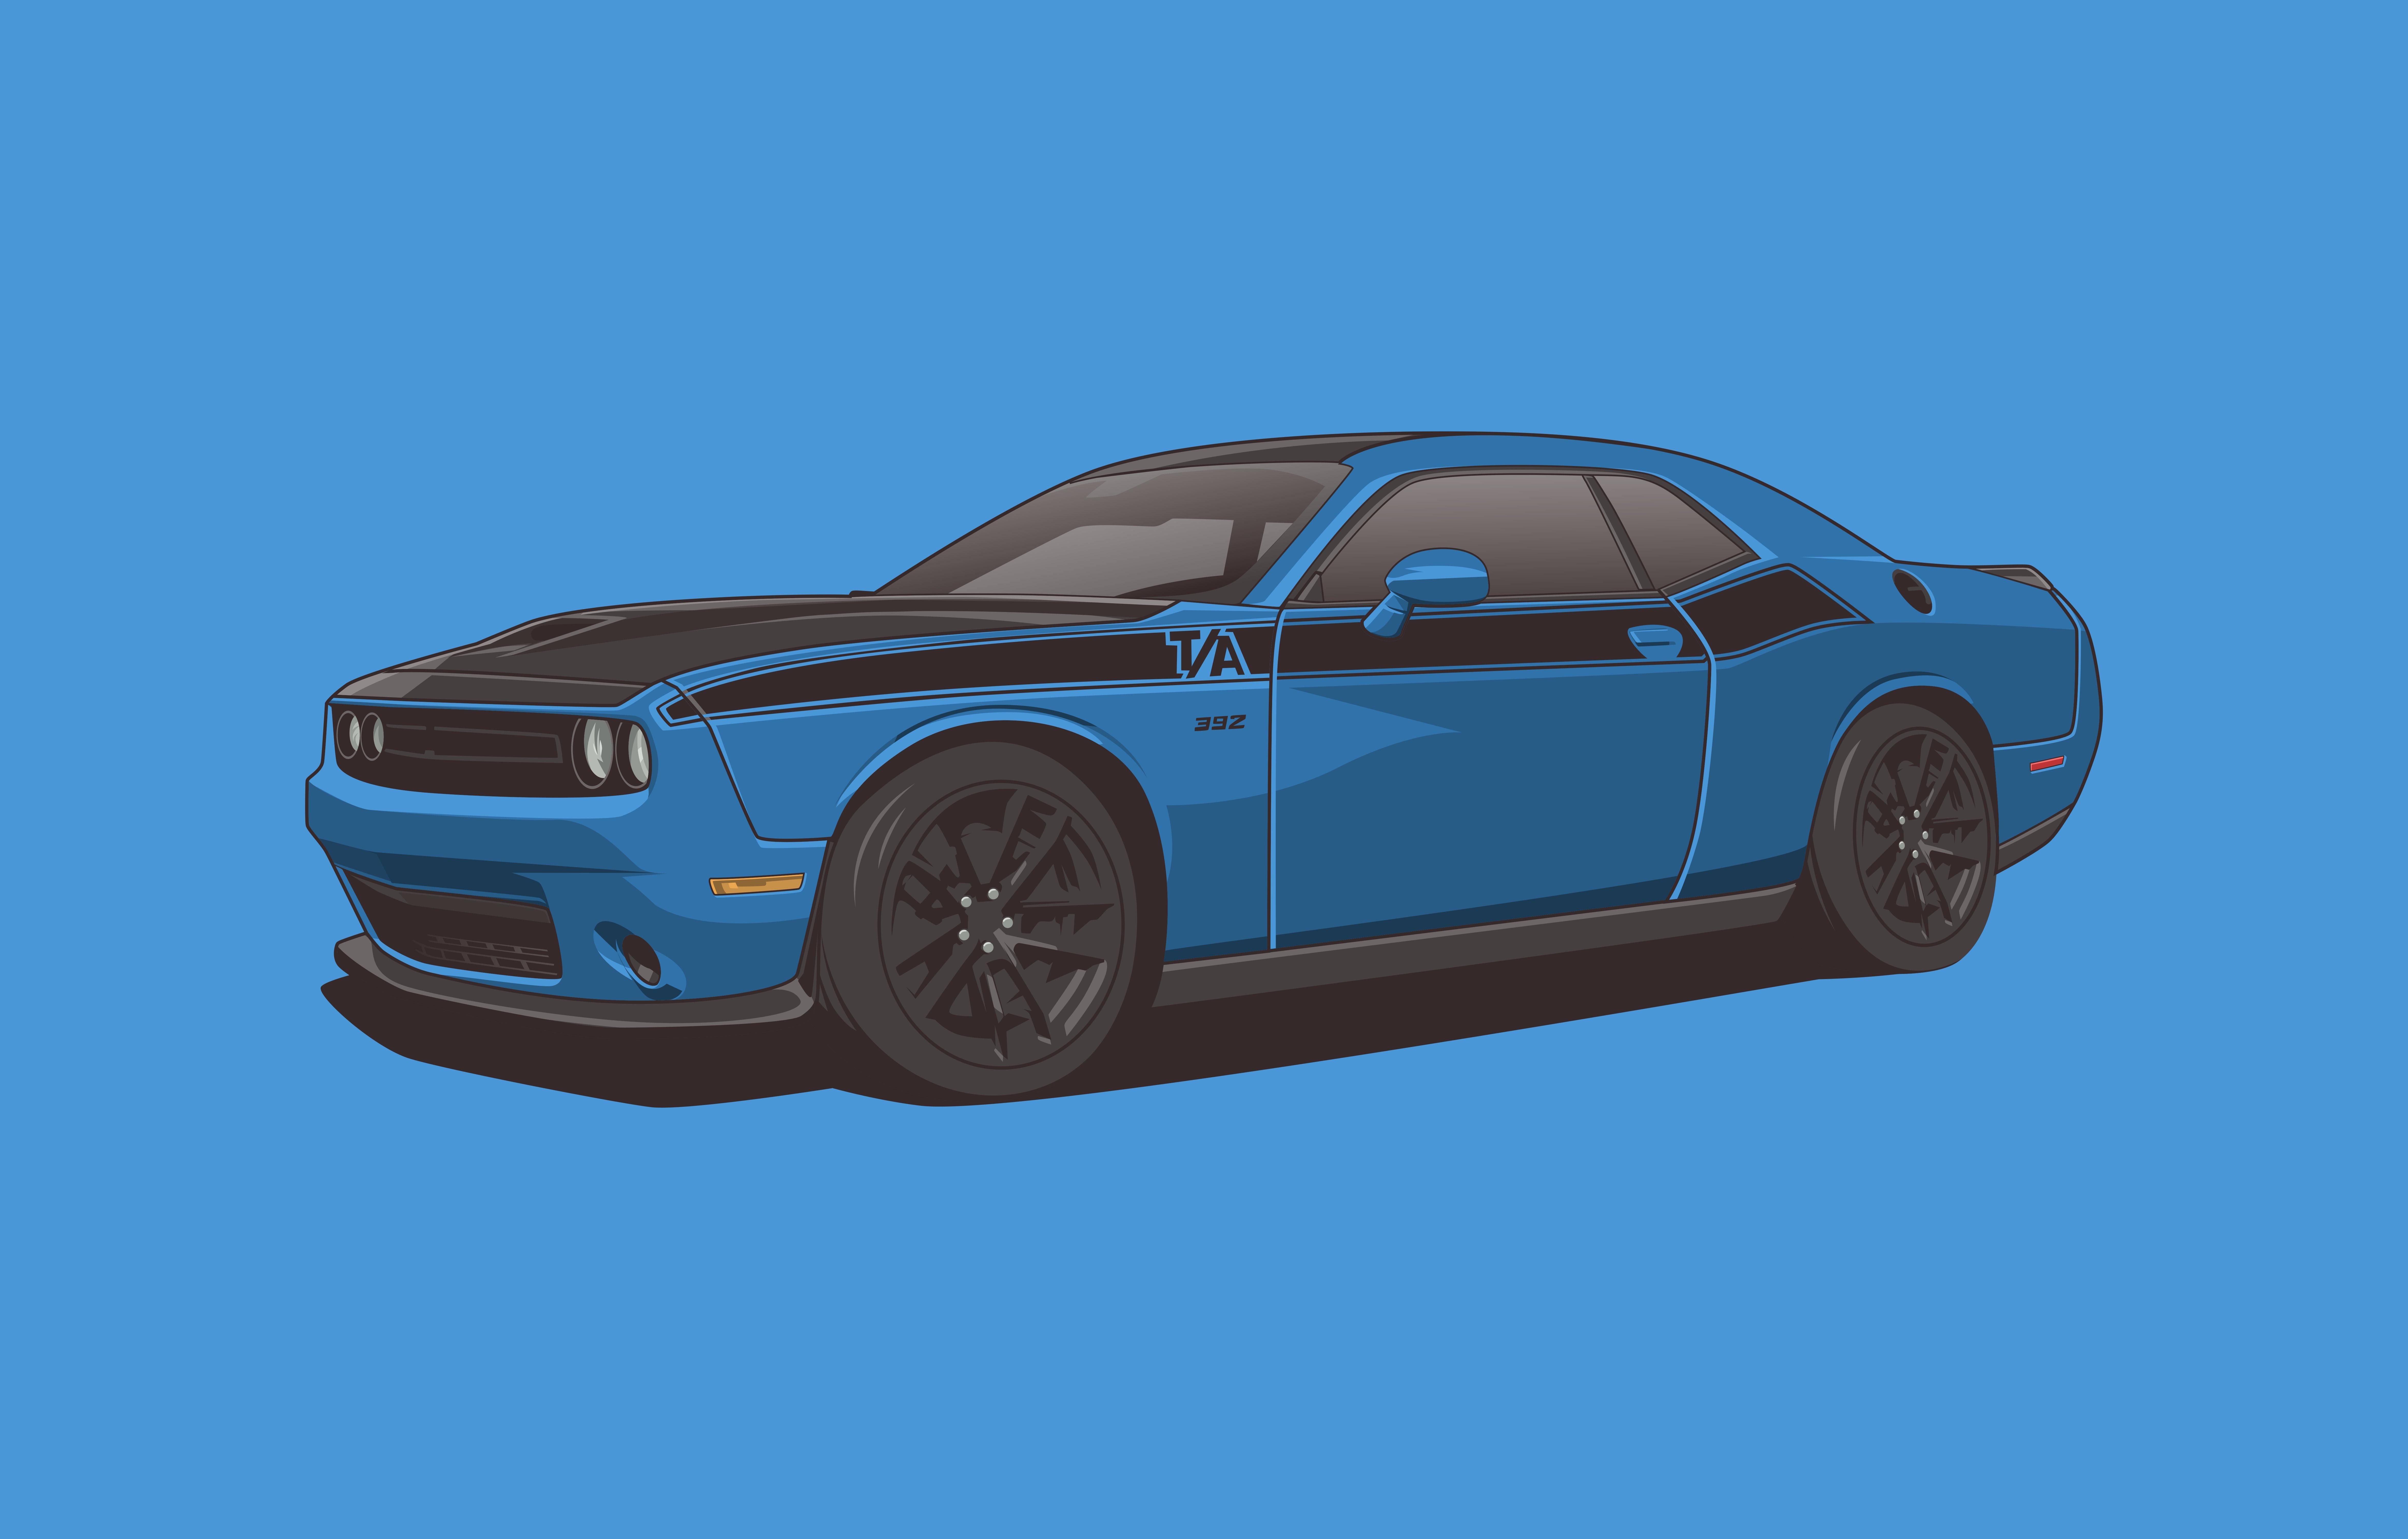 Blue Car Dodge Dodge Challenger Muscle Car 9385x6000